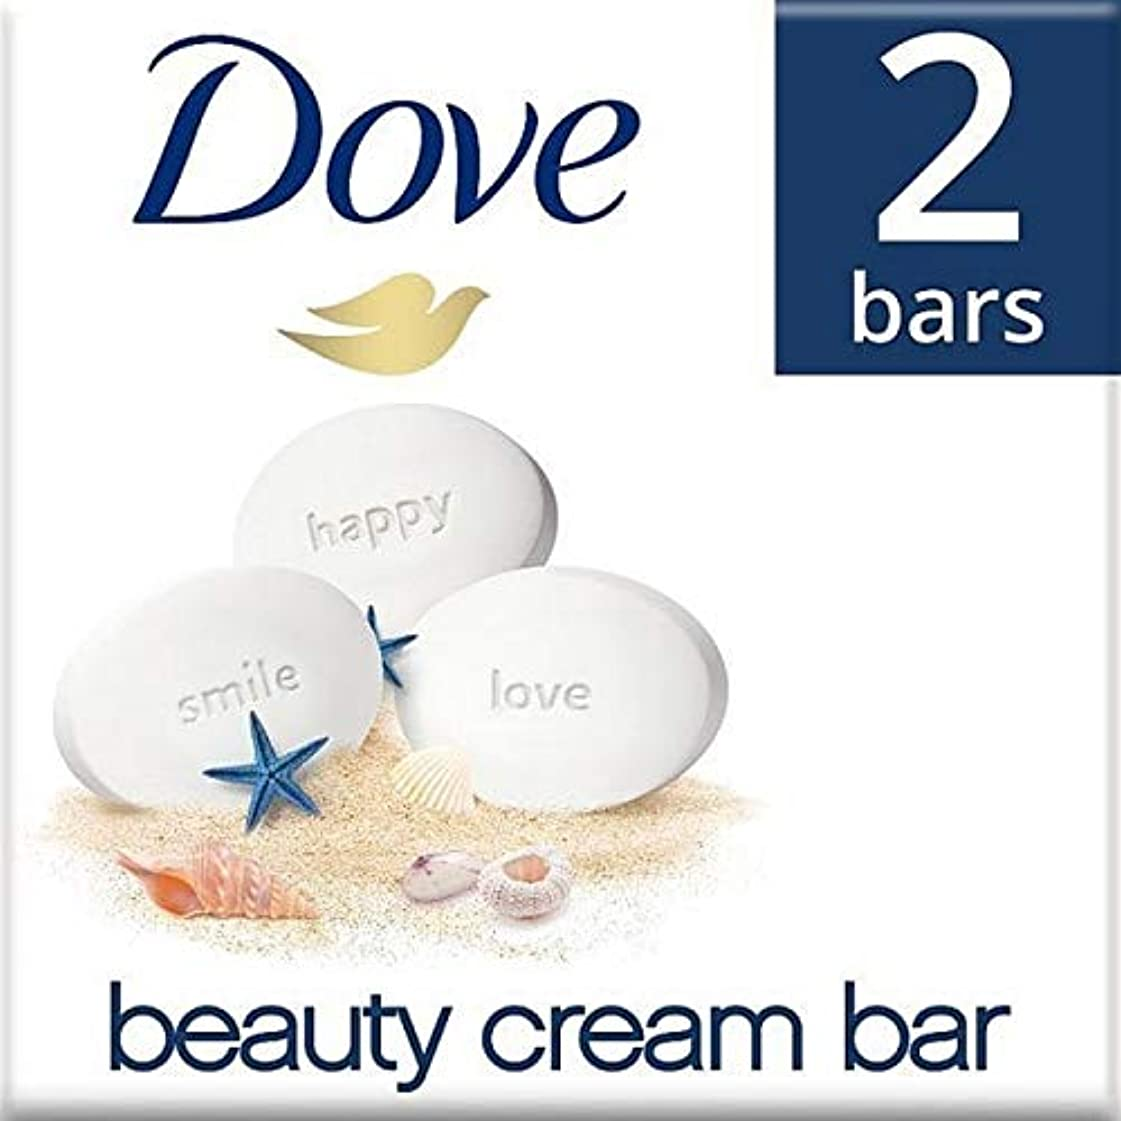 [Dove ] 鳩元美容クリーム石鹸2×100グラム - Dove Original Beauty Cream Soap Bar 2 x 100g [並行輸入品]